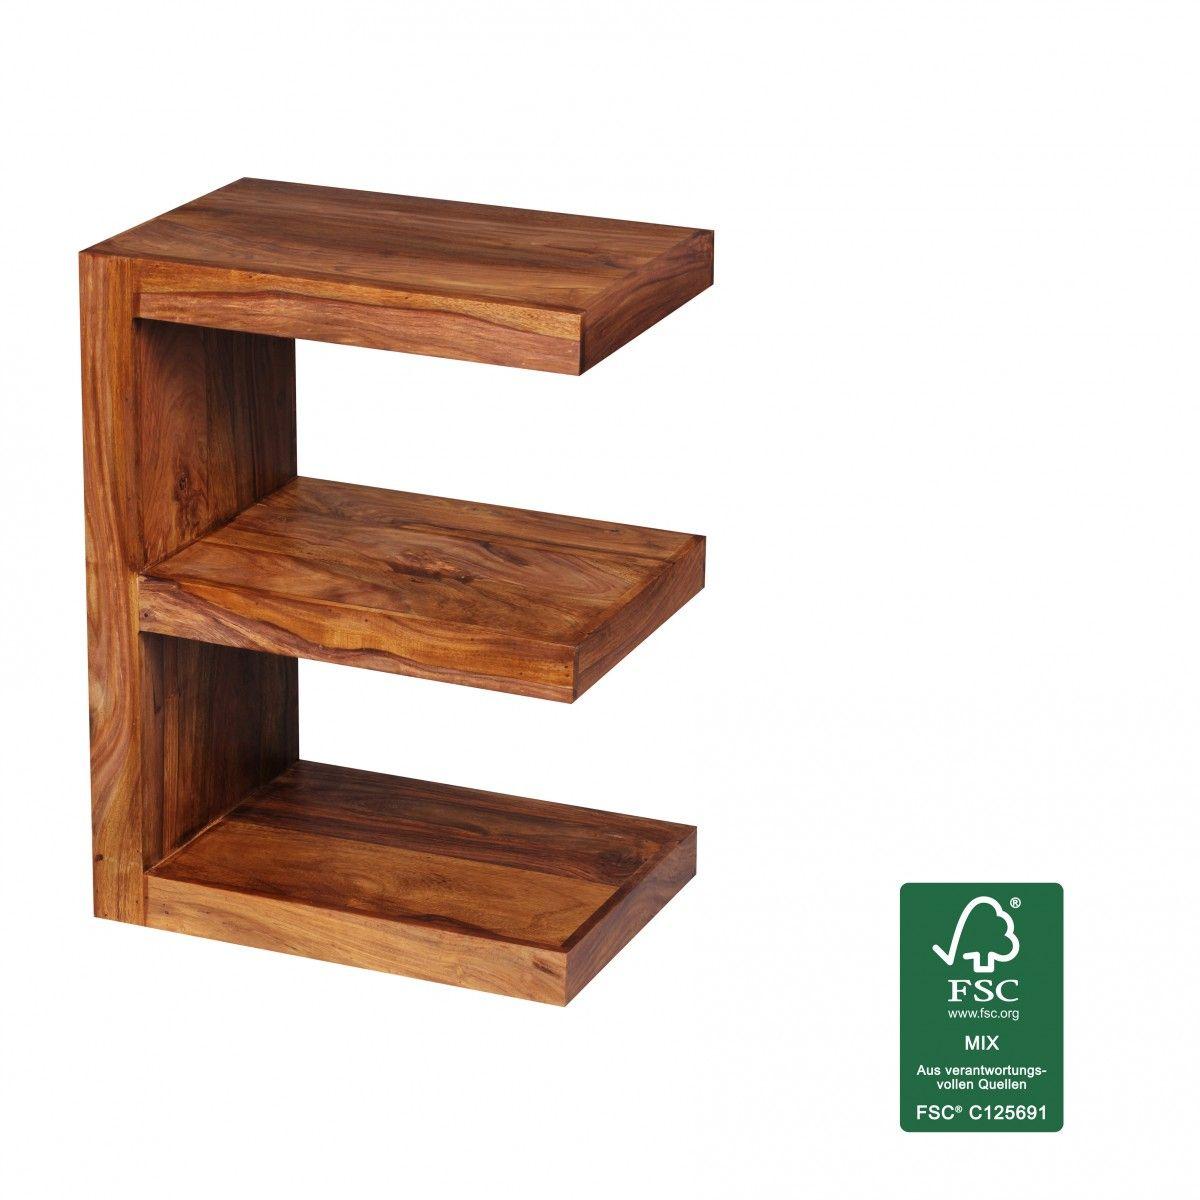 Finebuy Beistelltisch Massivholz Sheesham E Cube 60cm Hoch